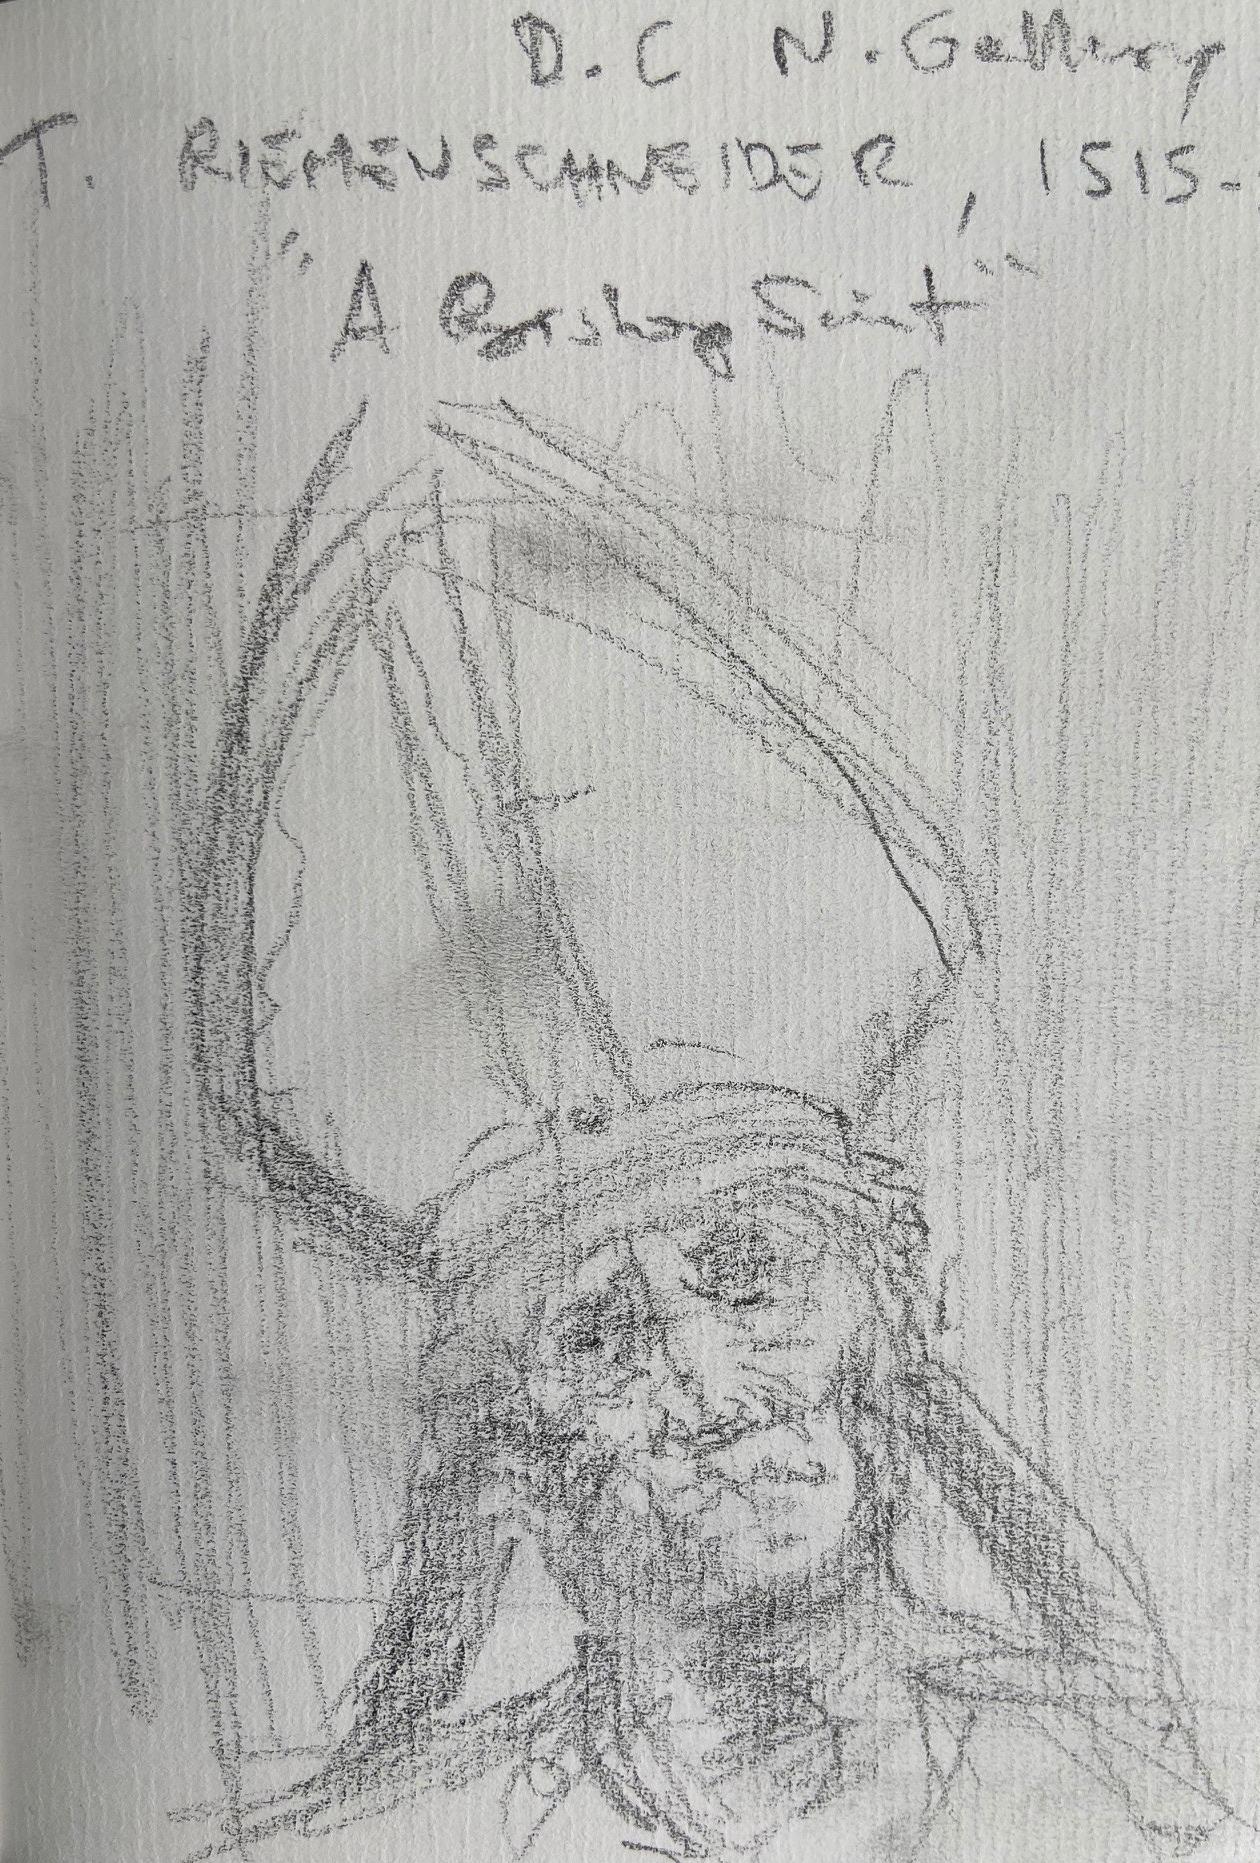 Tilman Riemenschneider, A Bishop Saint, 1515, escultura em madeira, Justino, desenho a lápis, 2019.